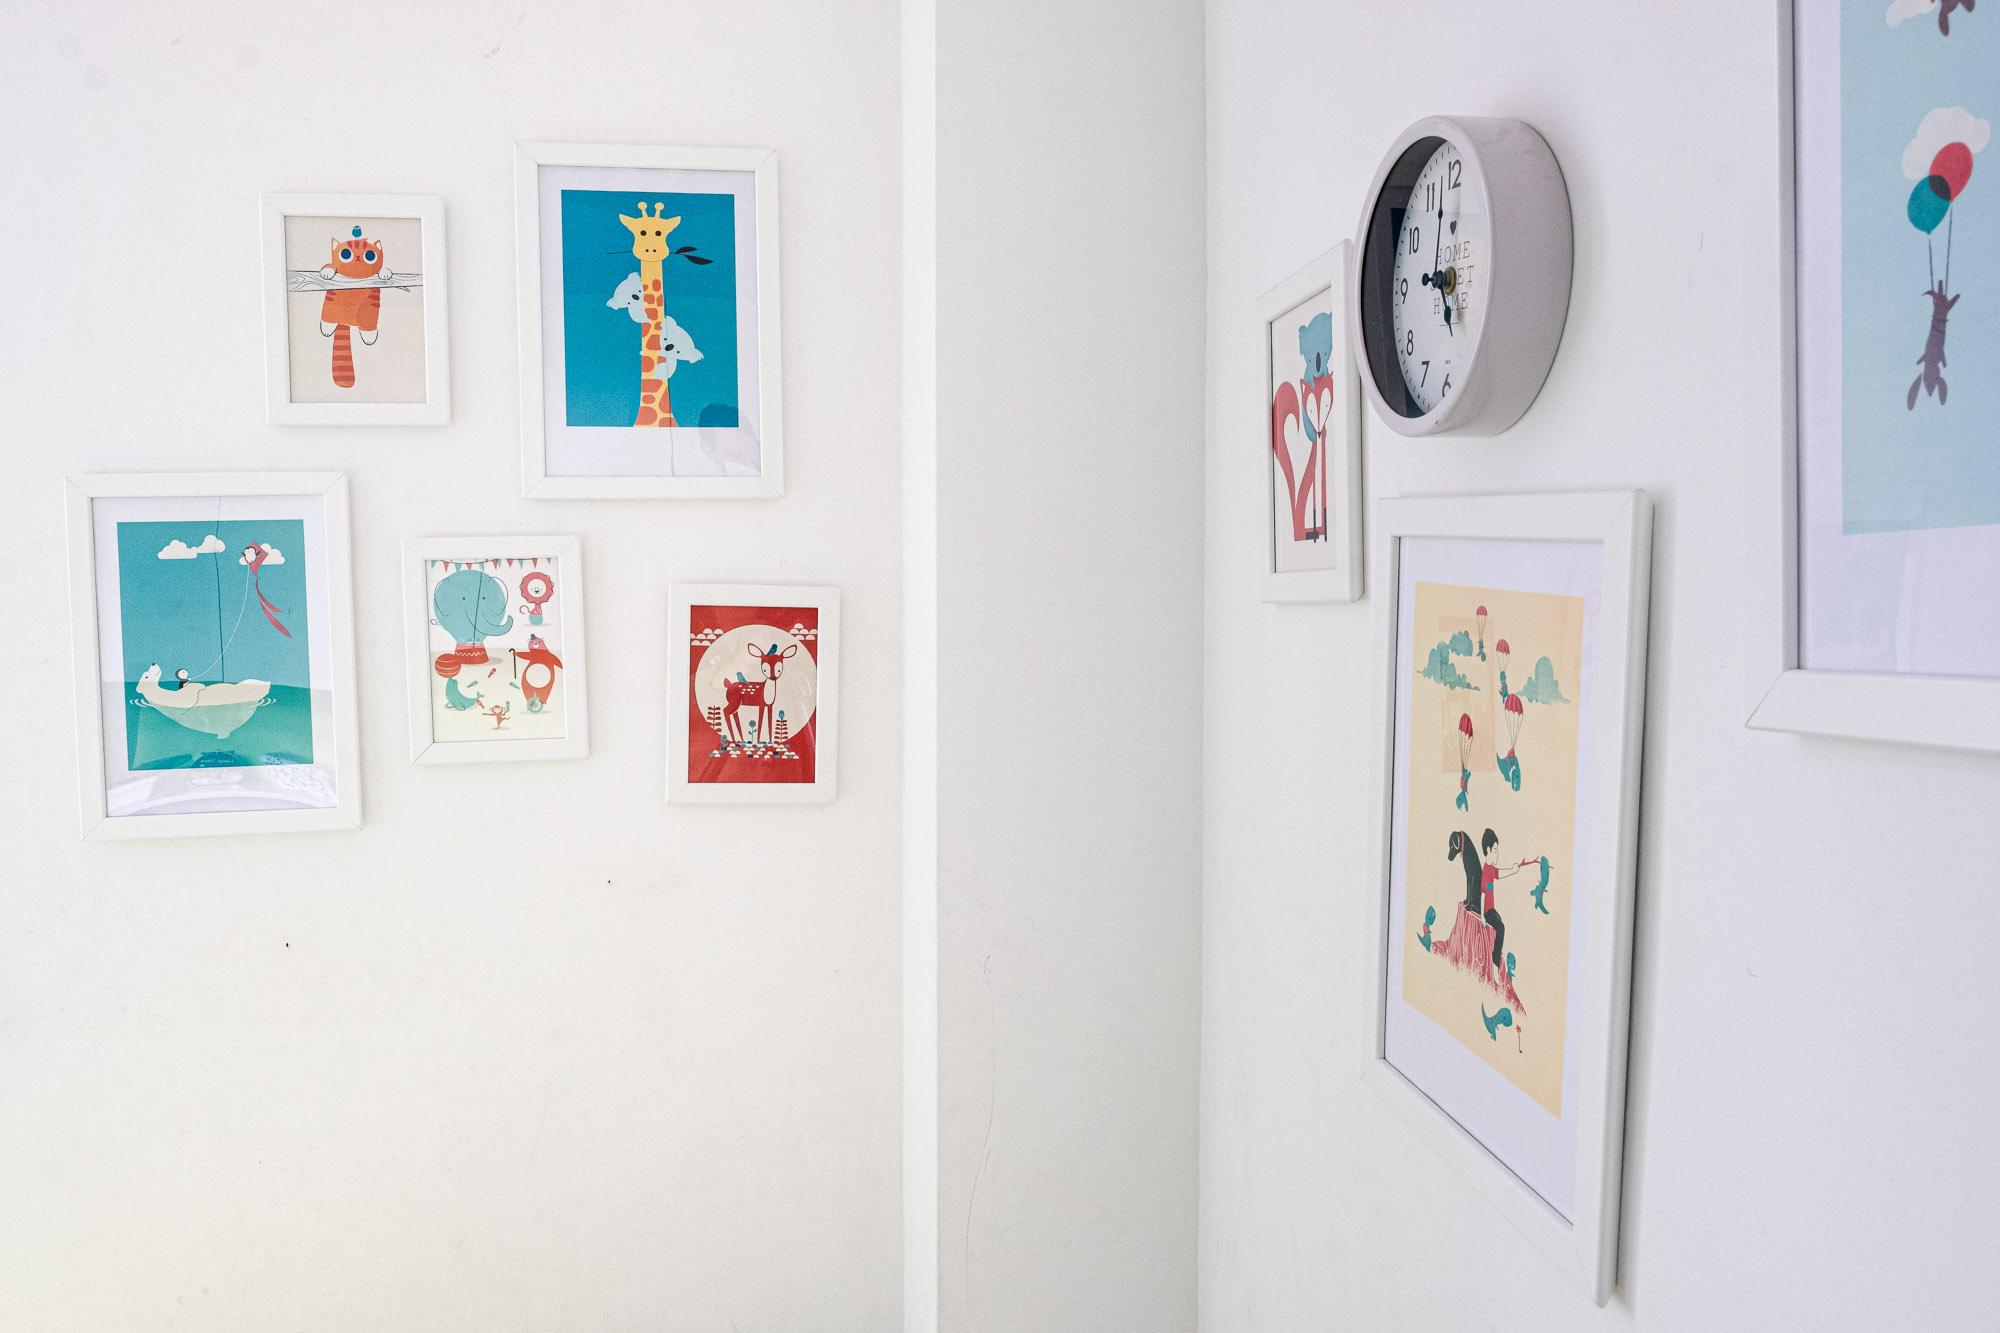 Wand Kinderzimmer